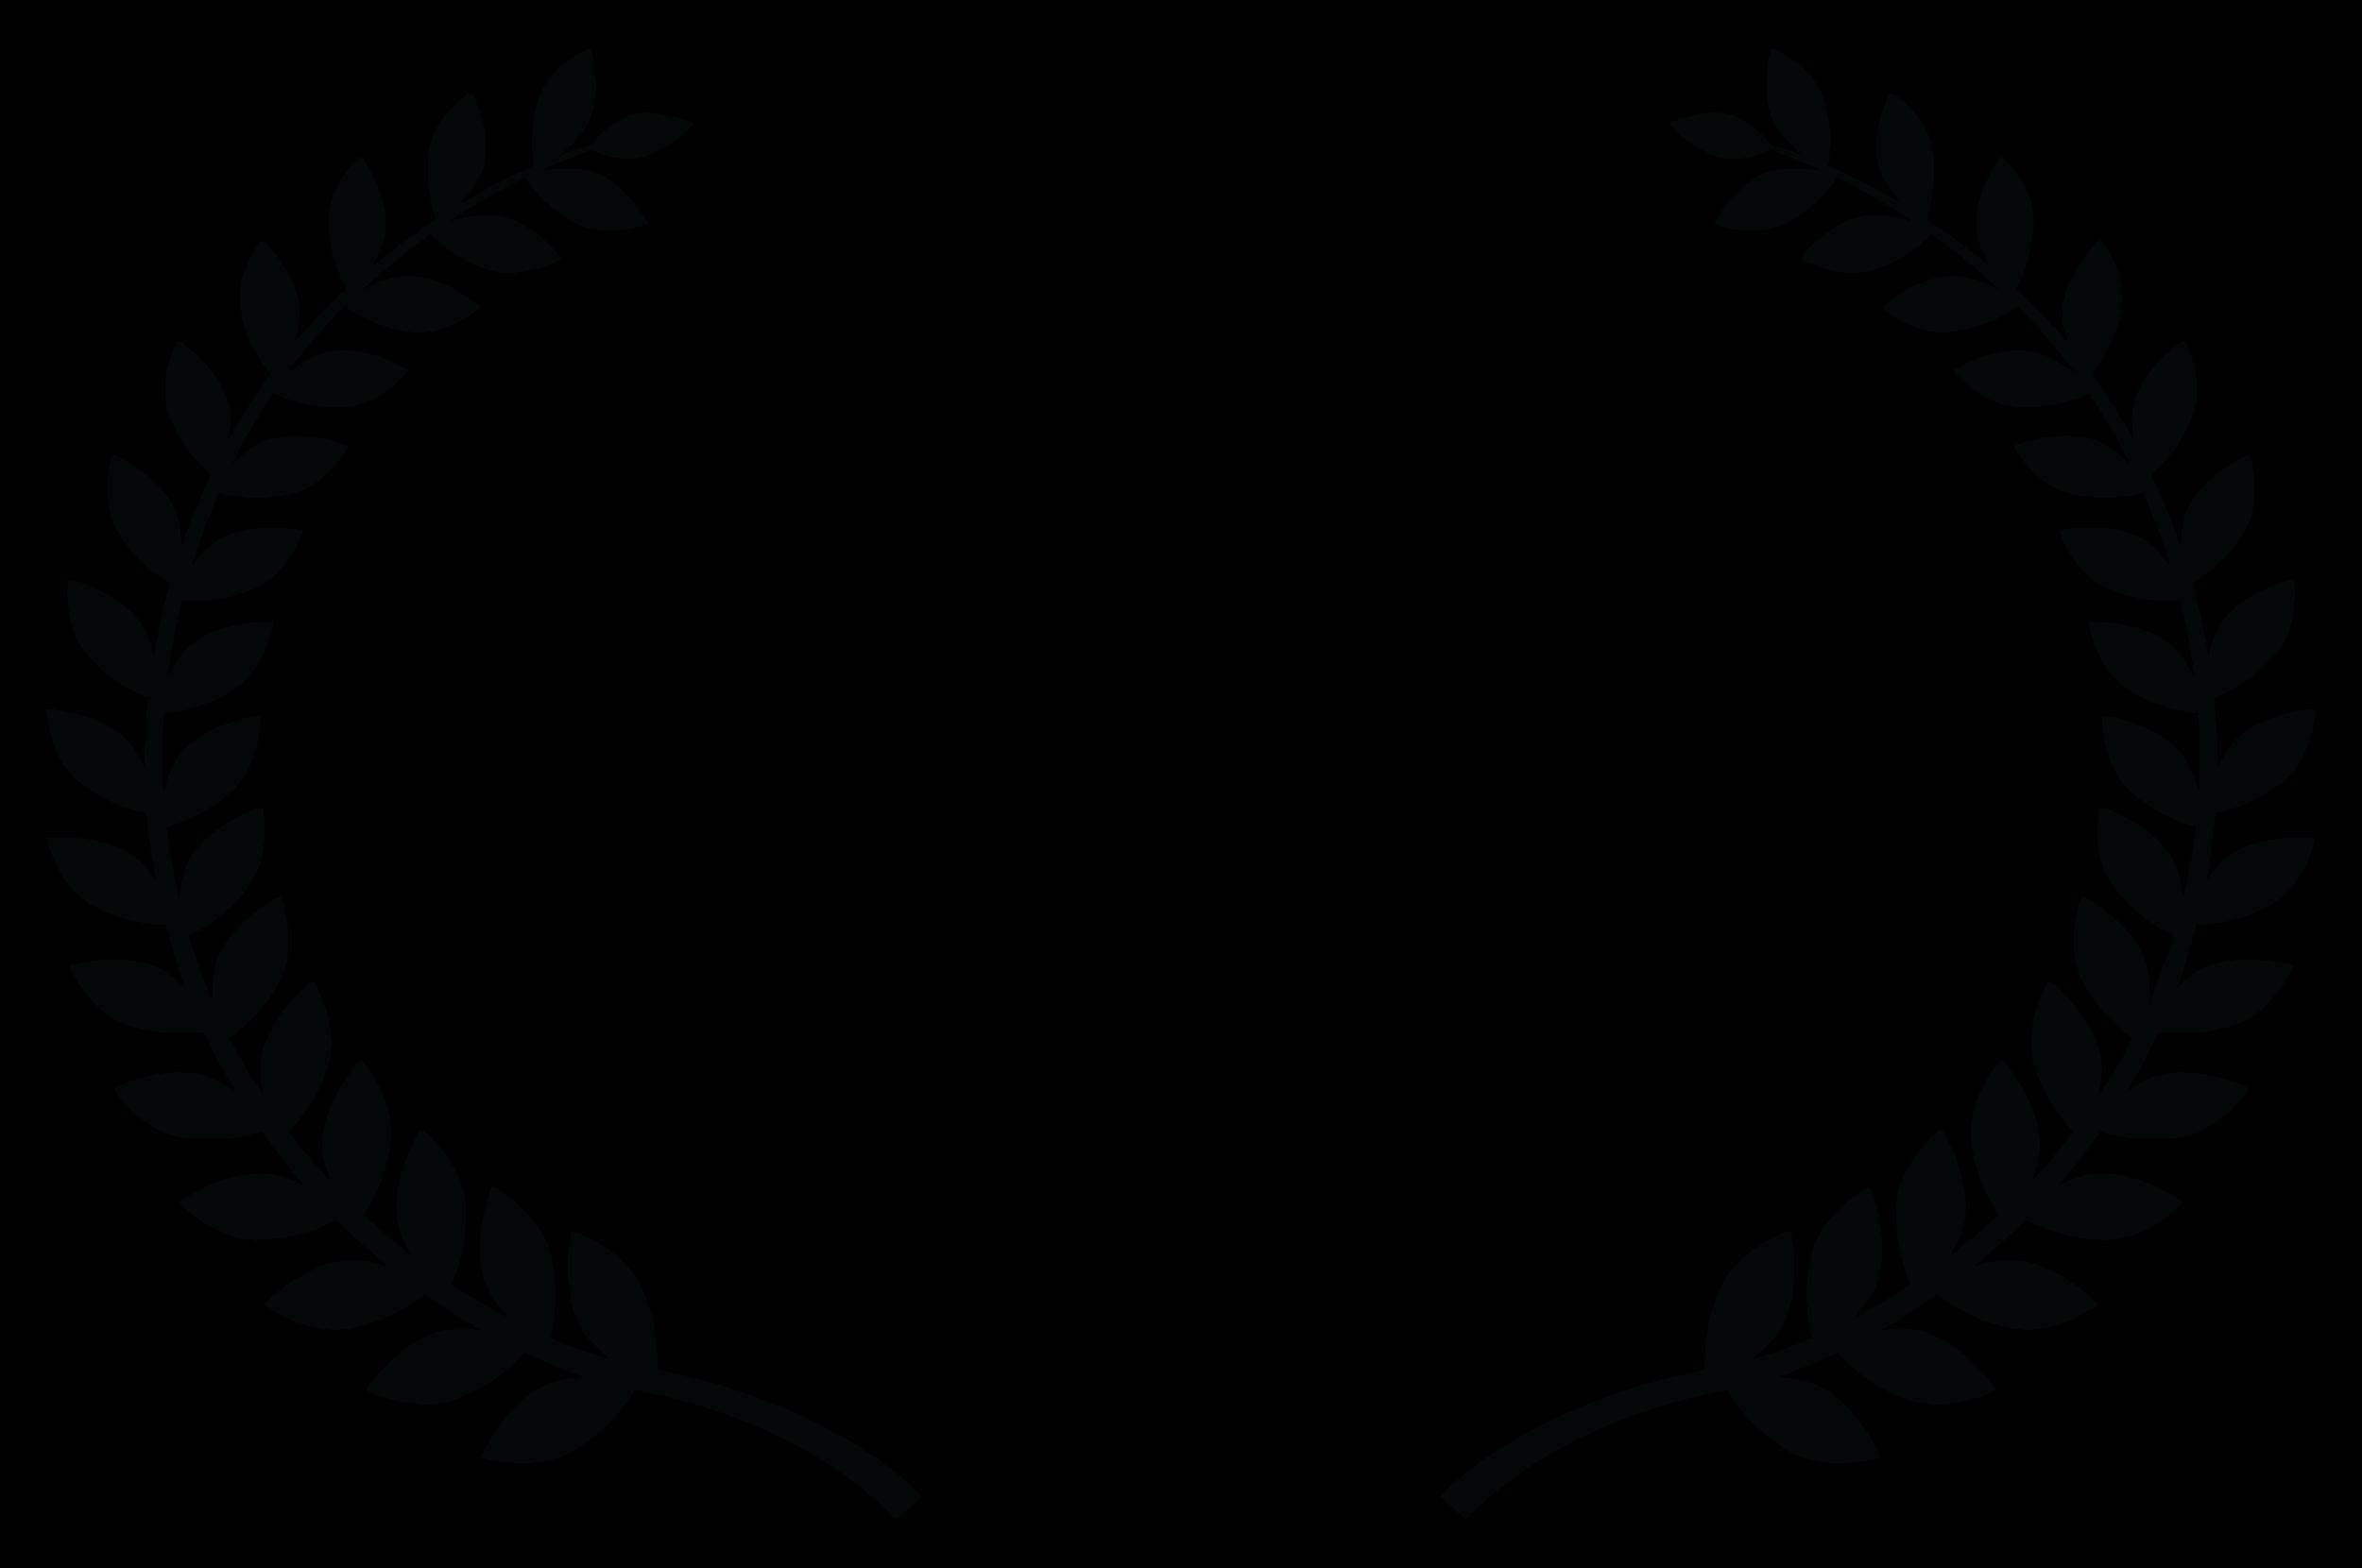 OFFICIALSELECTION-WomensInternationalFilmArtsFestival-2016.png